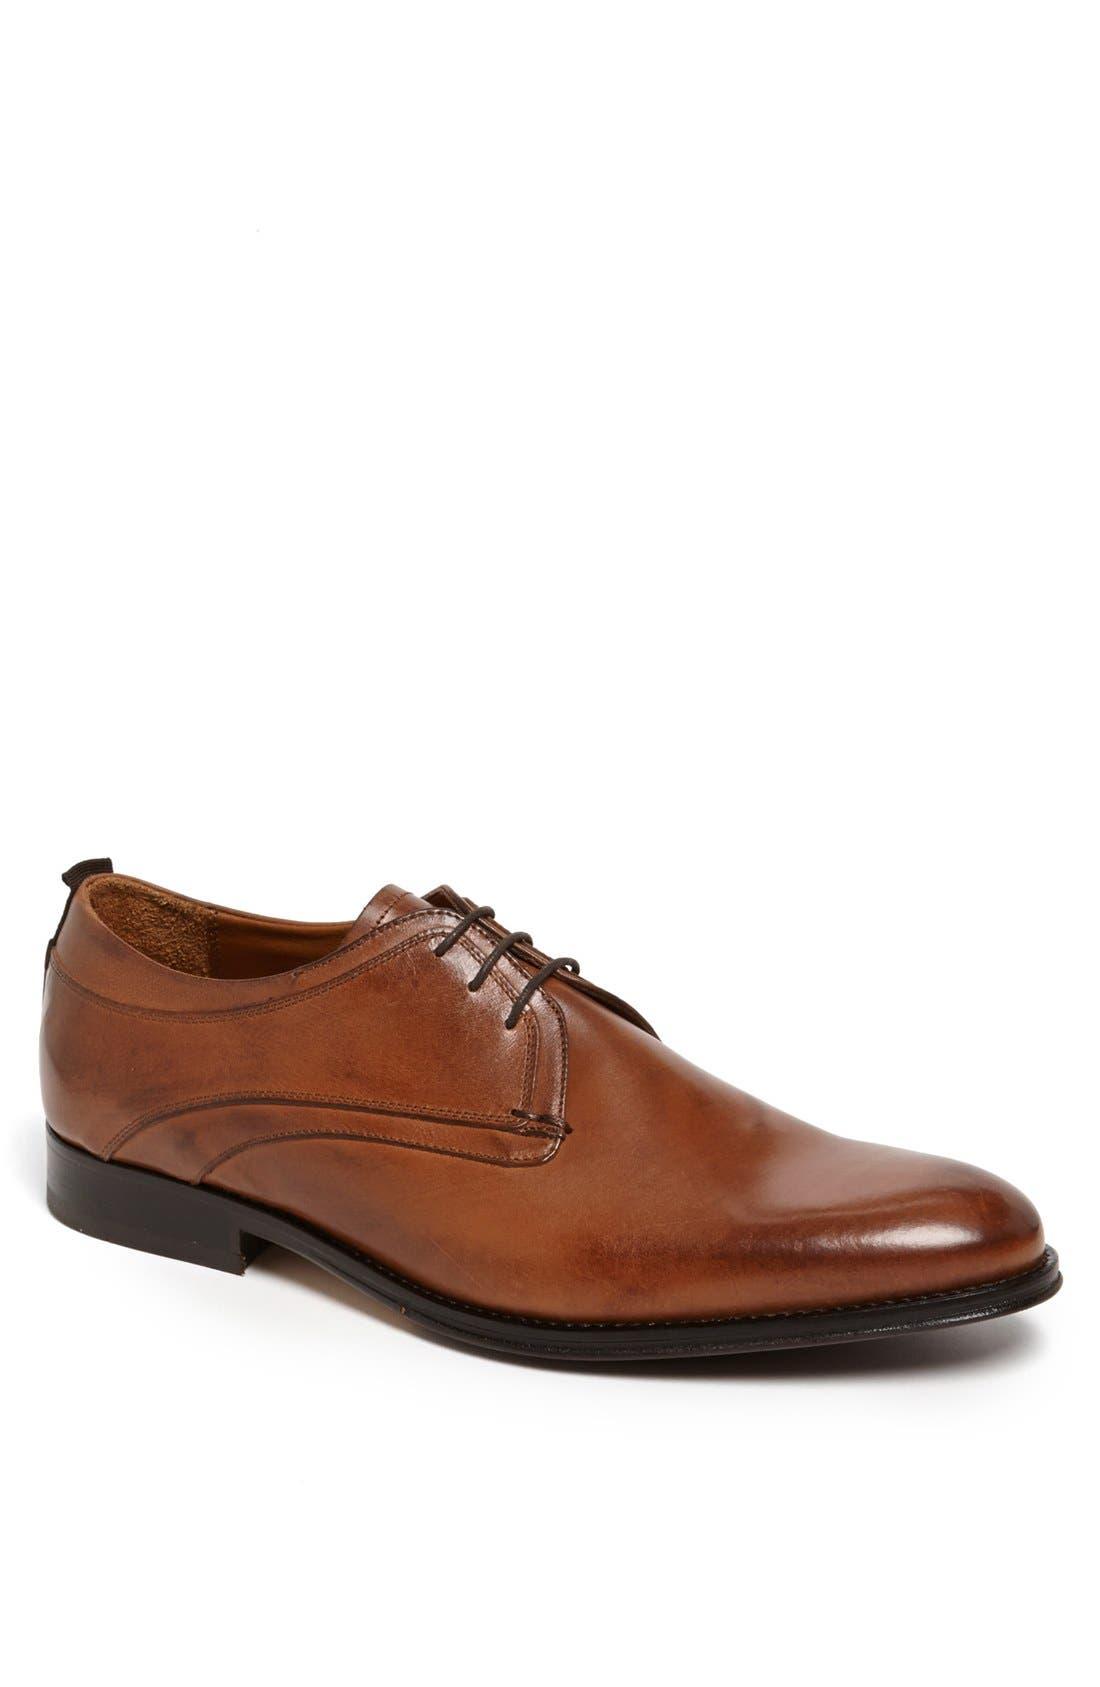 Main Image - ALDO 'Tumma' Plain Toe Derby (Men)